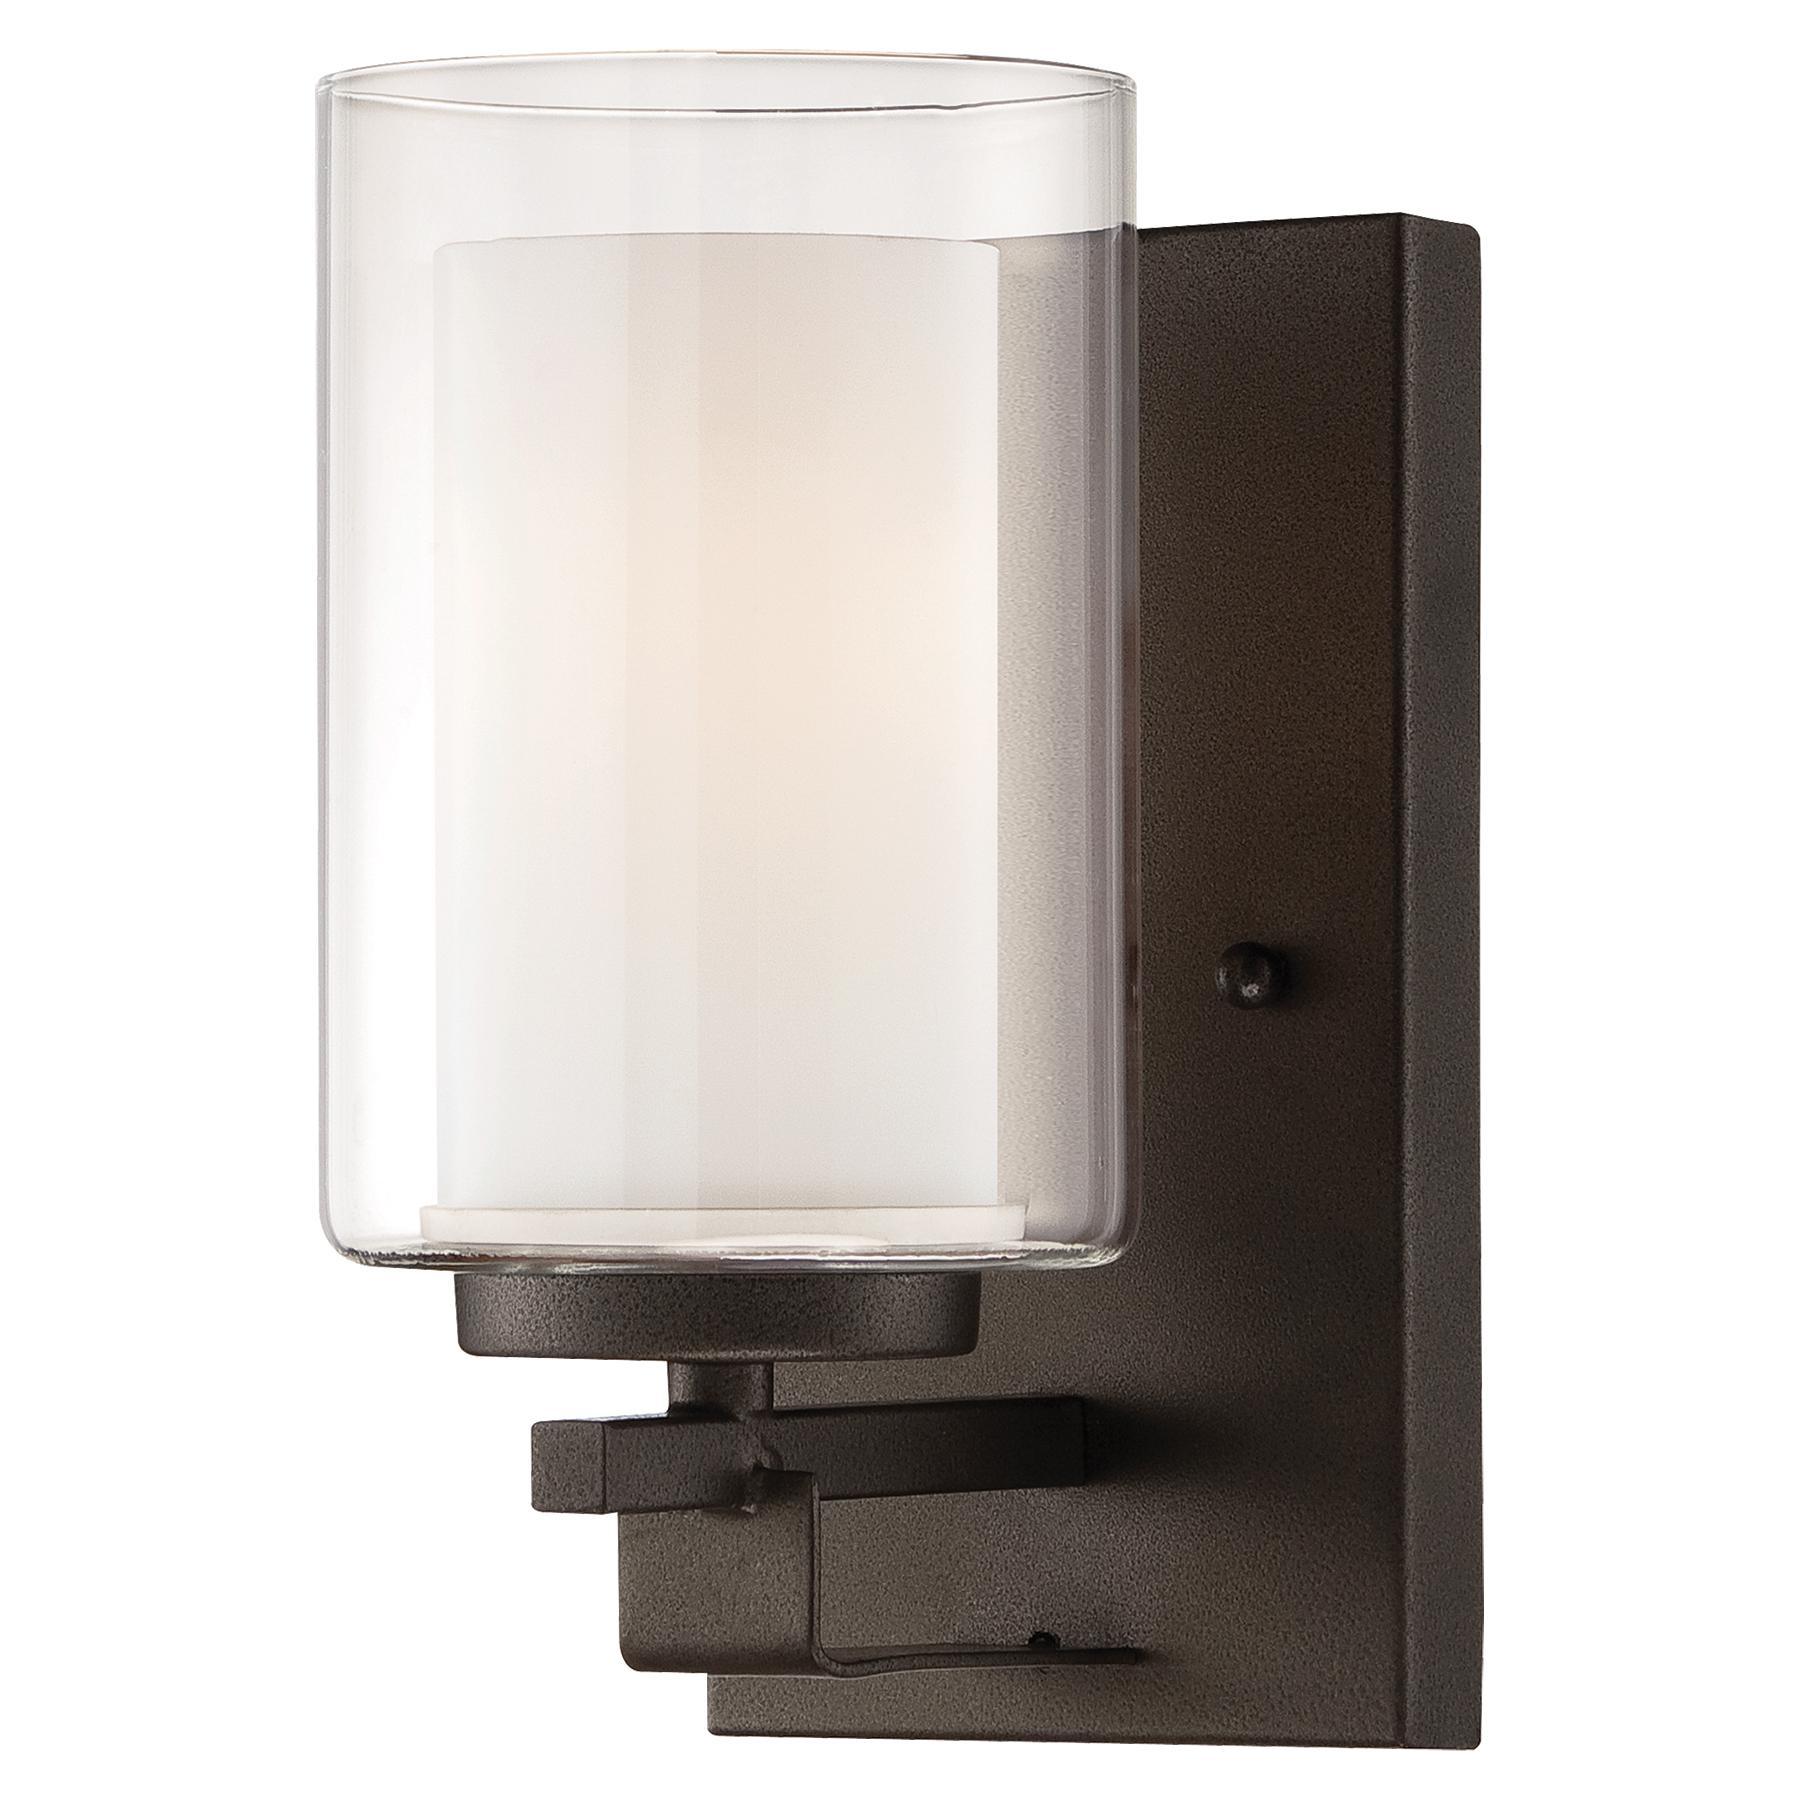 Parsons Studio Bathroom Vanity Light By Minka Lavery - Minka bathroom vanity lights